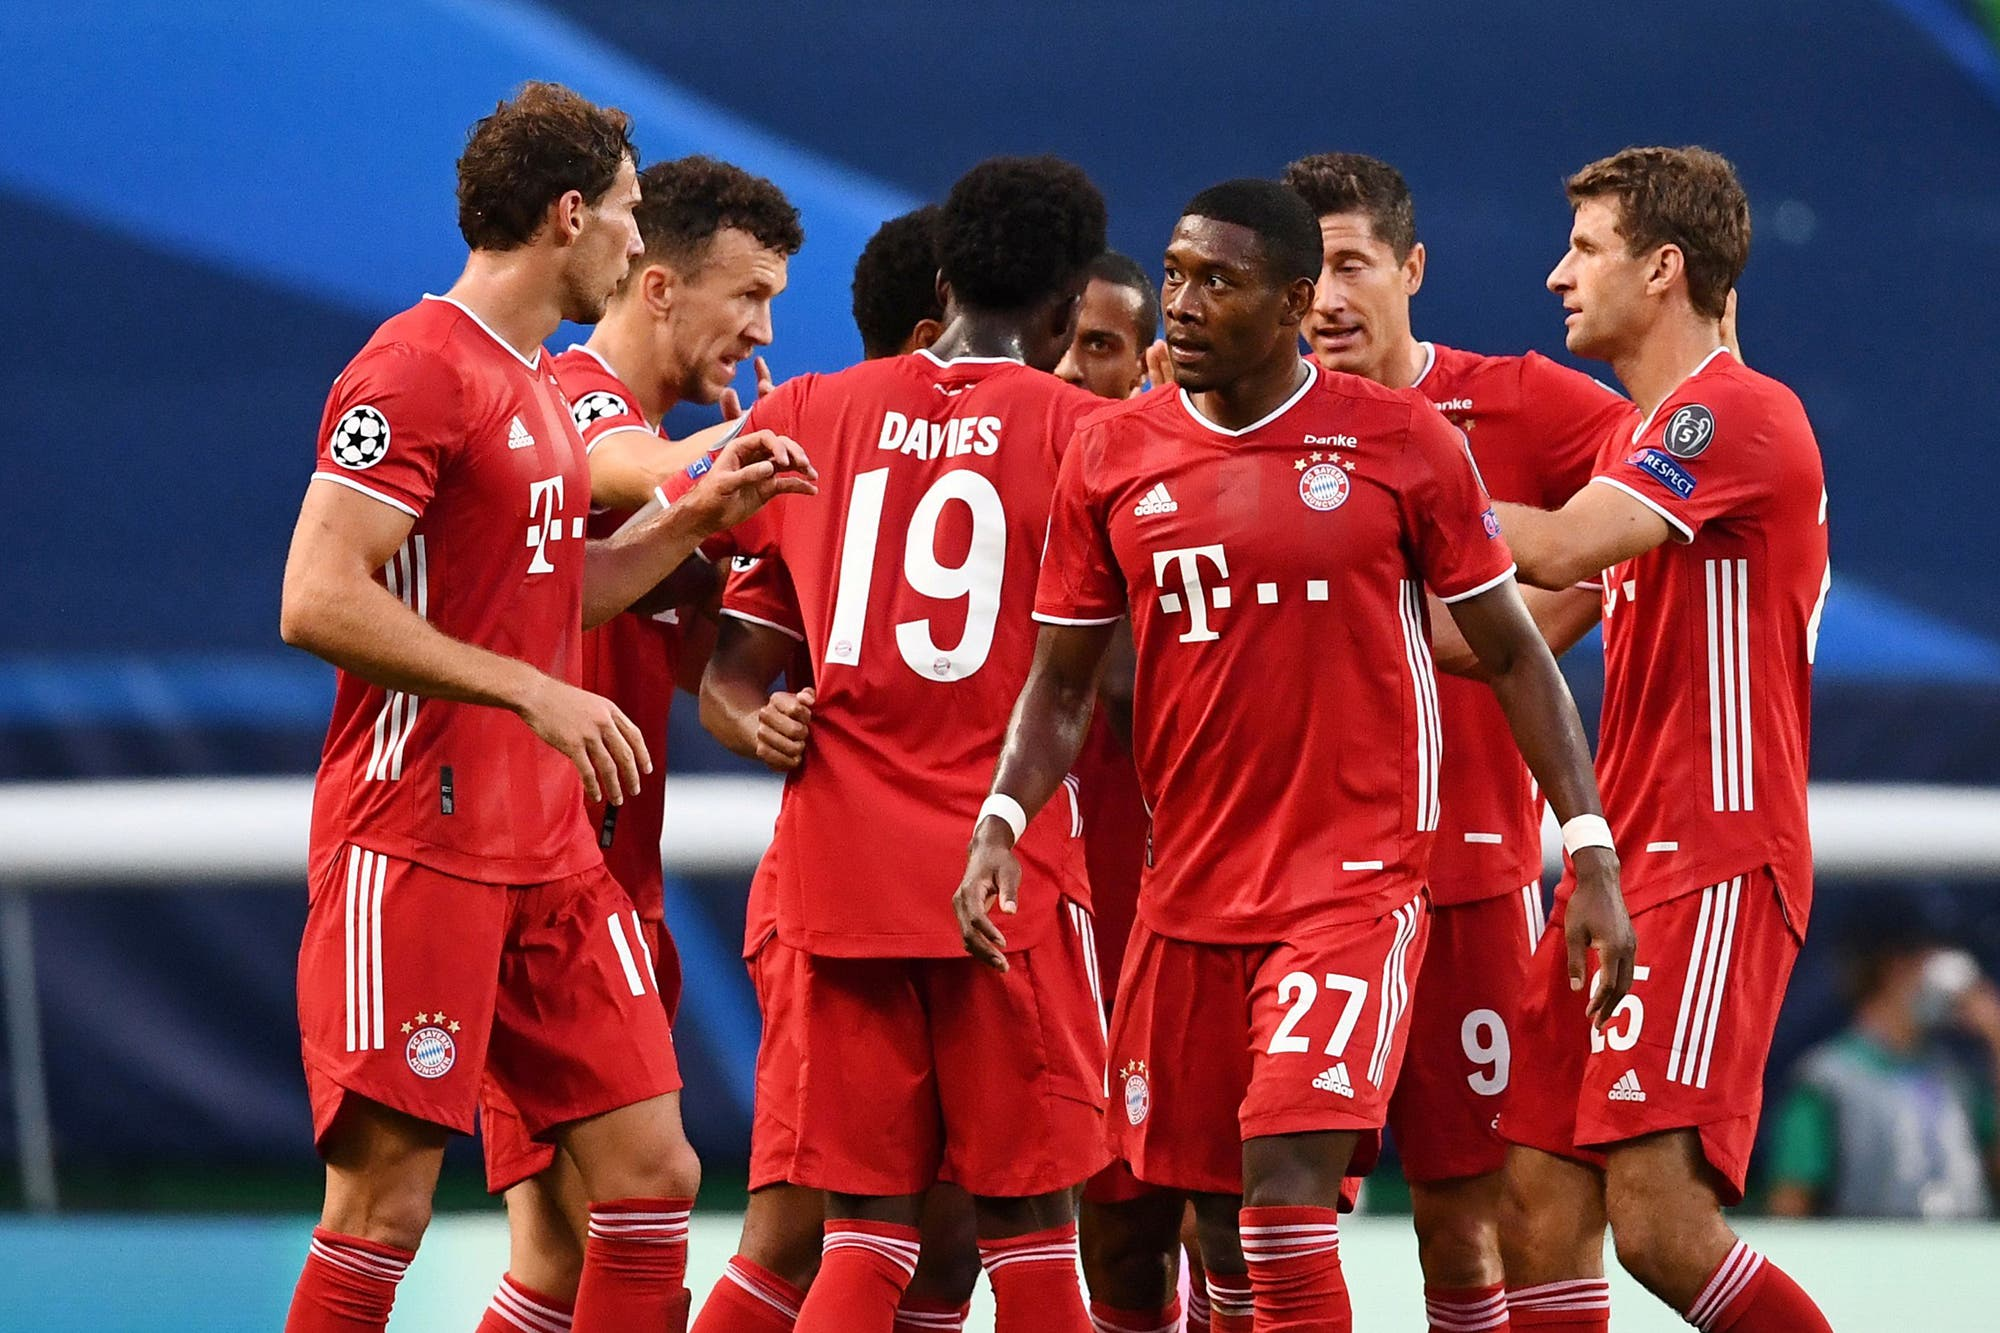 Los impactantes números de Bayern Múnich en la Champions League: ganó los 10 partidos que jugó y marcó 42 goles